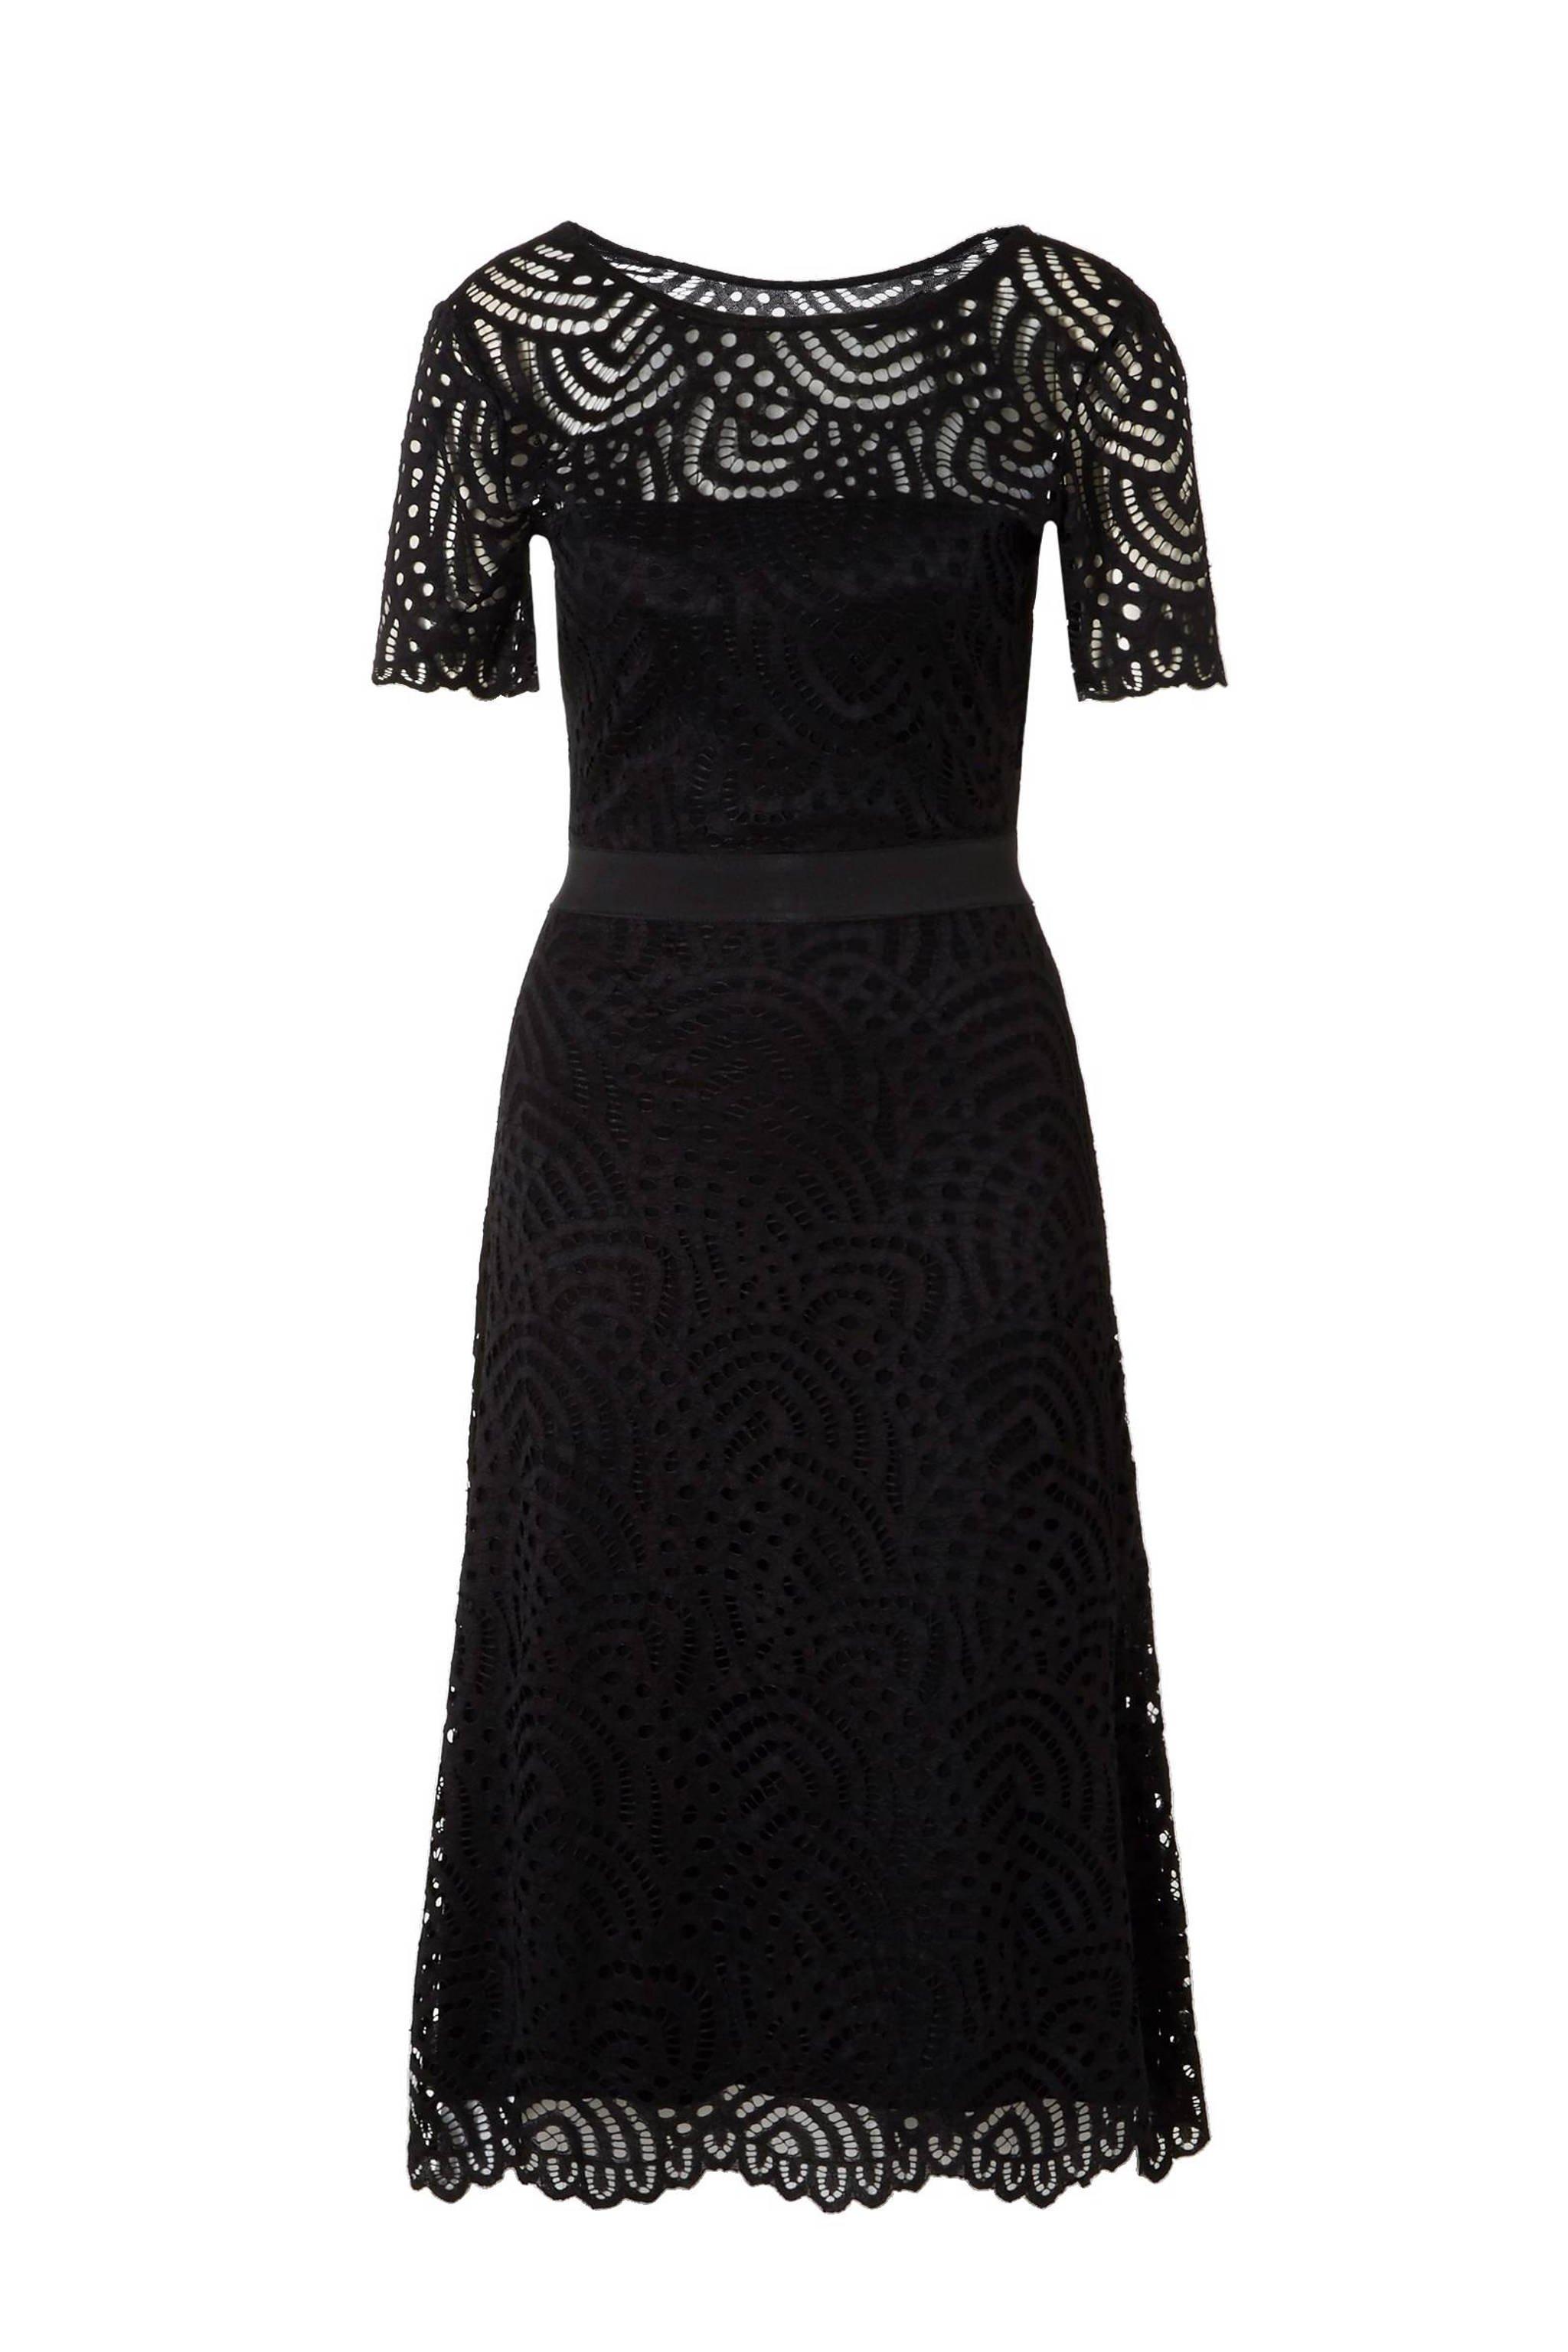 Favoriete whkmp's own kanten jurk | wehkamp &CR39